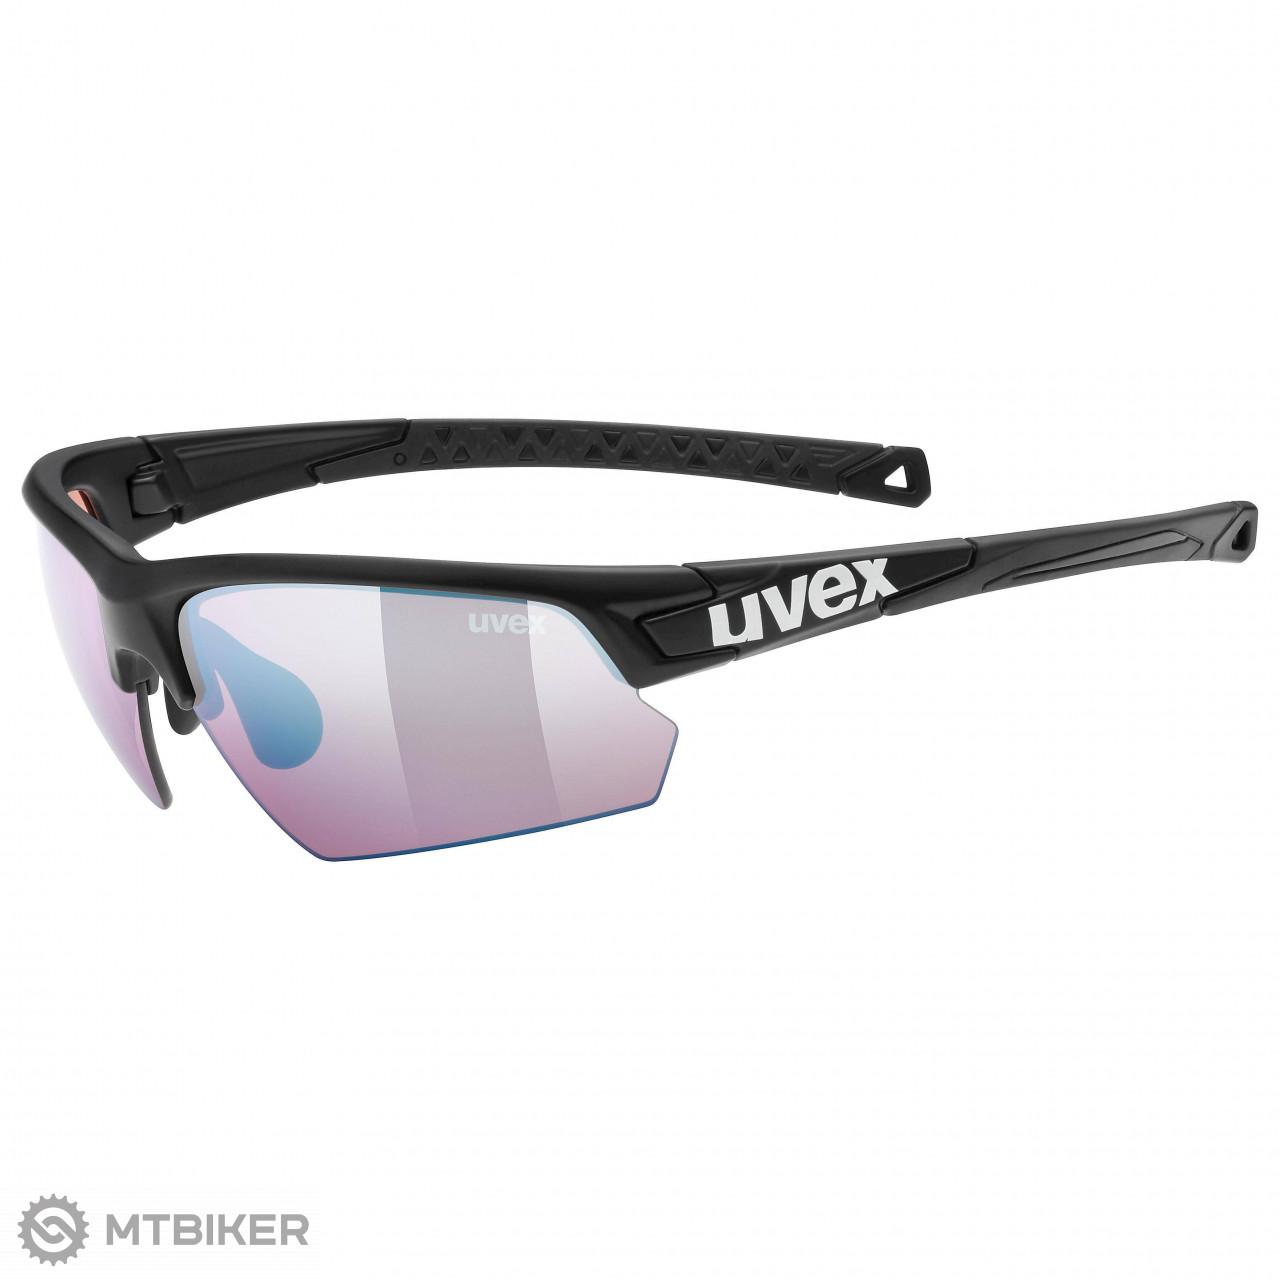 487ea474e Uvex Sportstyle 224 ColorVision športové okuliare čierne mat ...